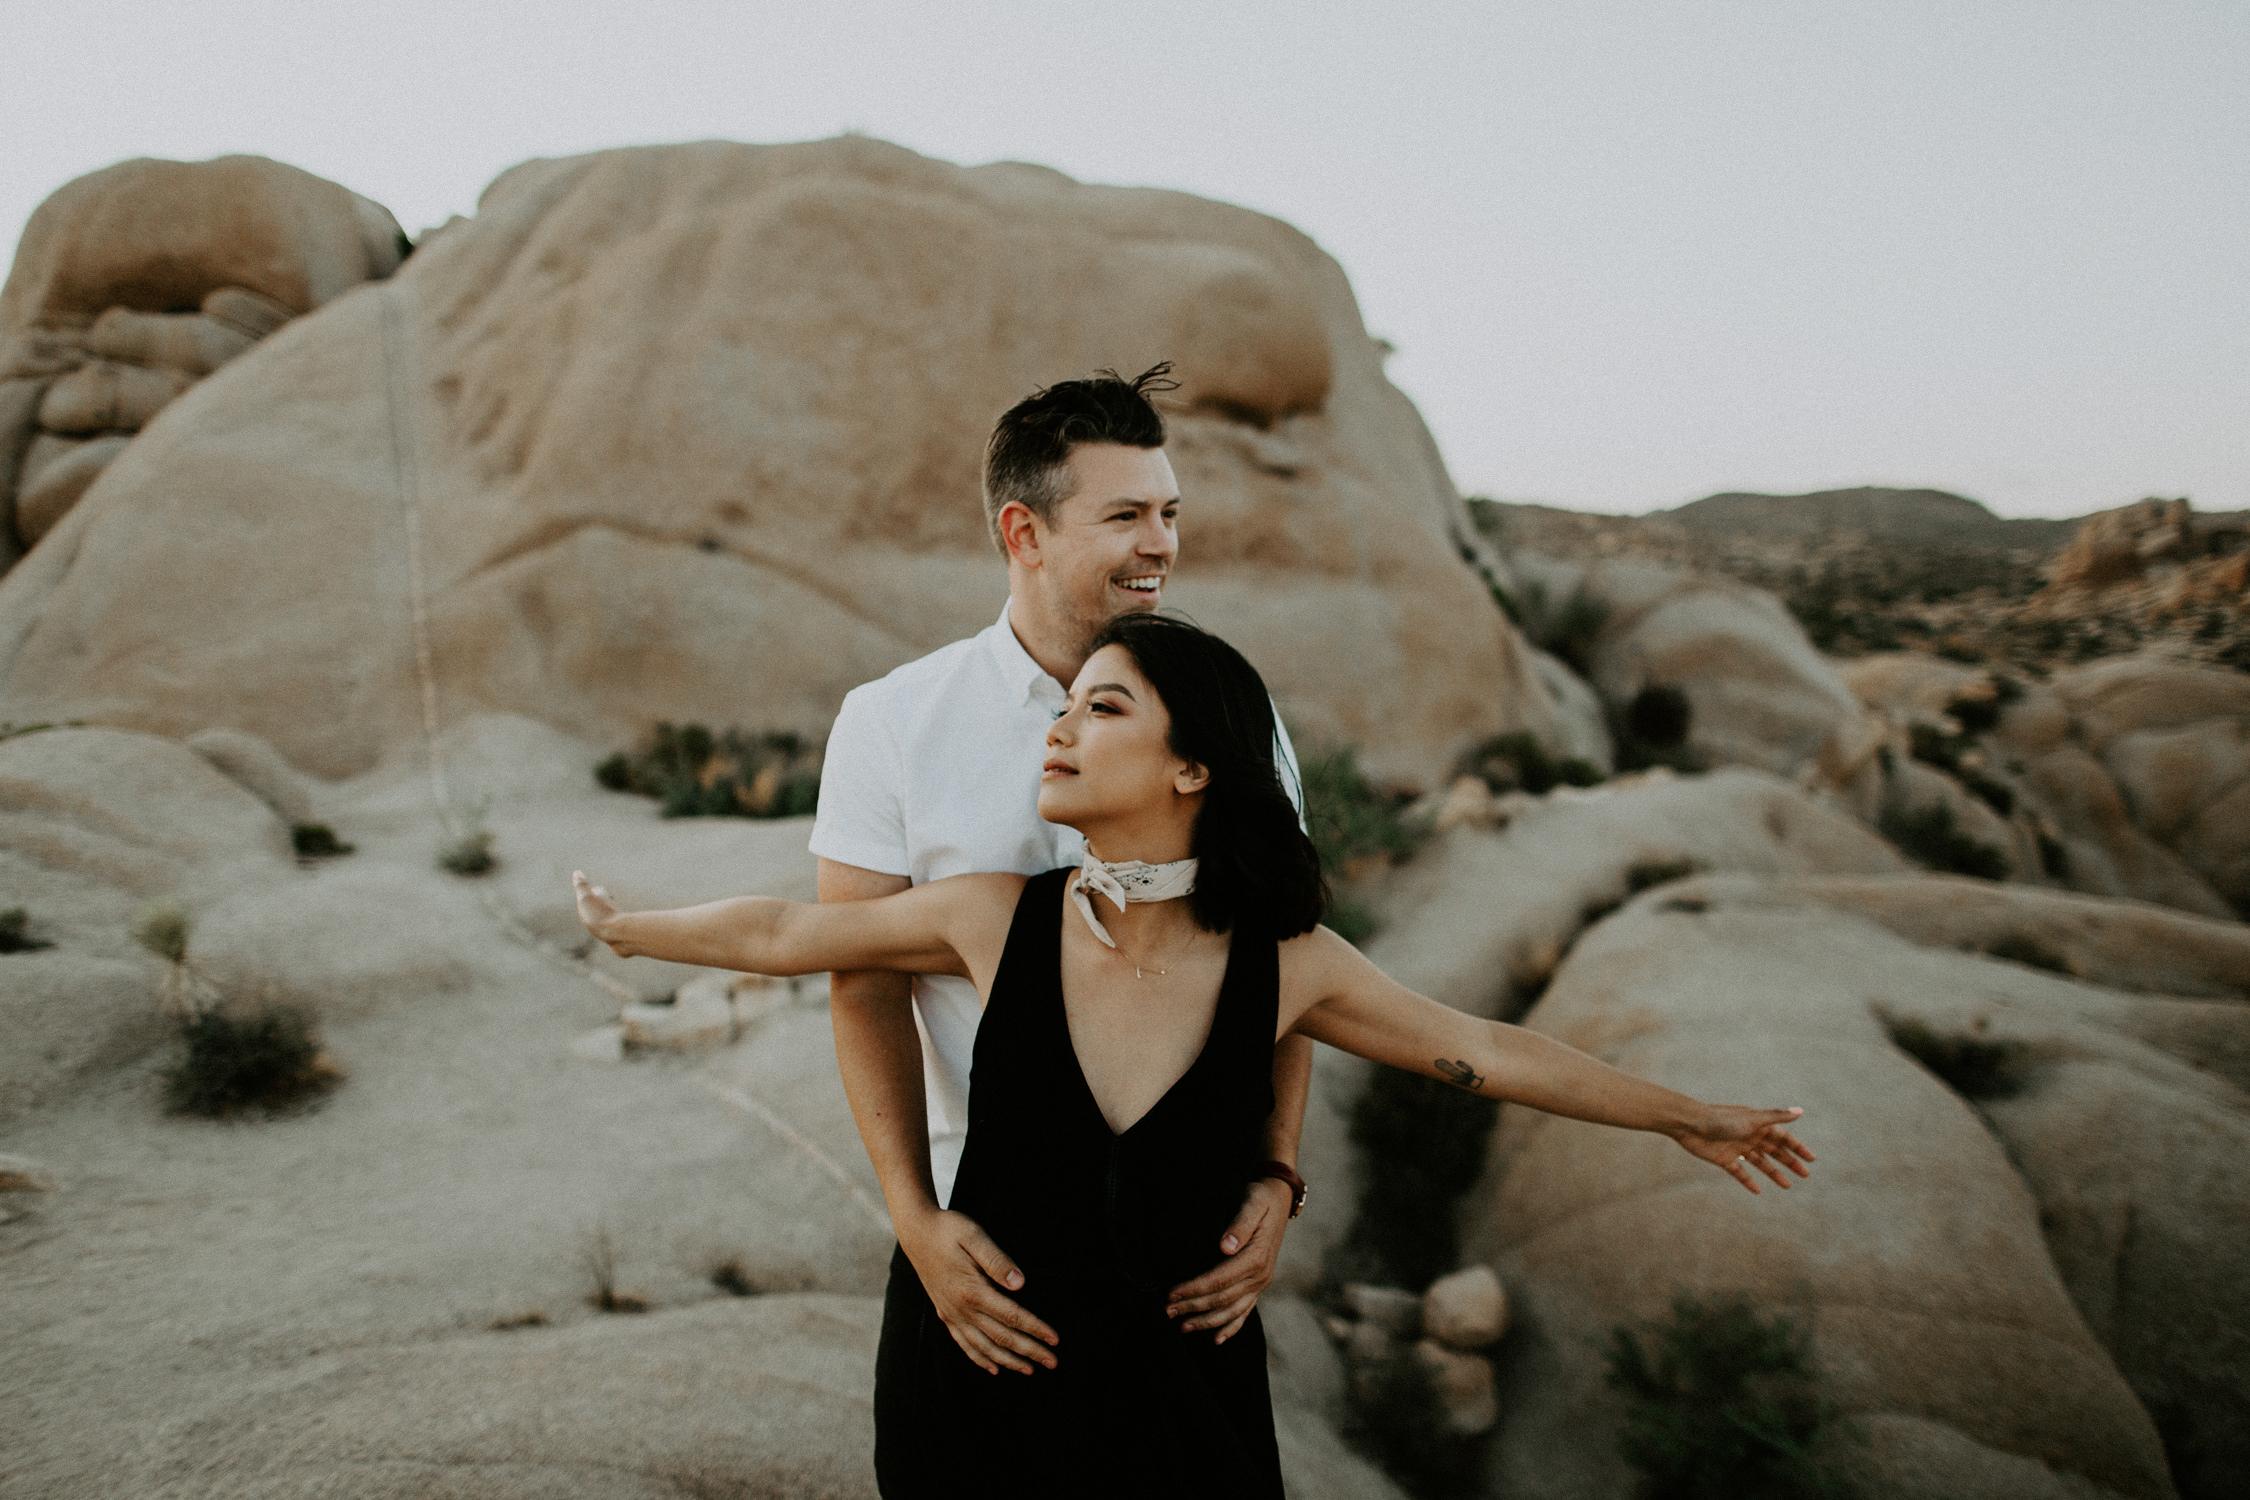 couple-intimate-engagement-session-joshua-tree-34.jpg